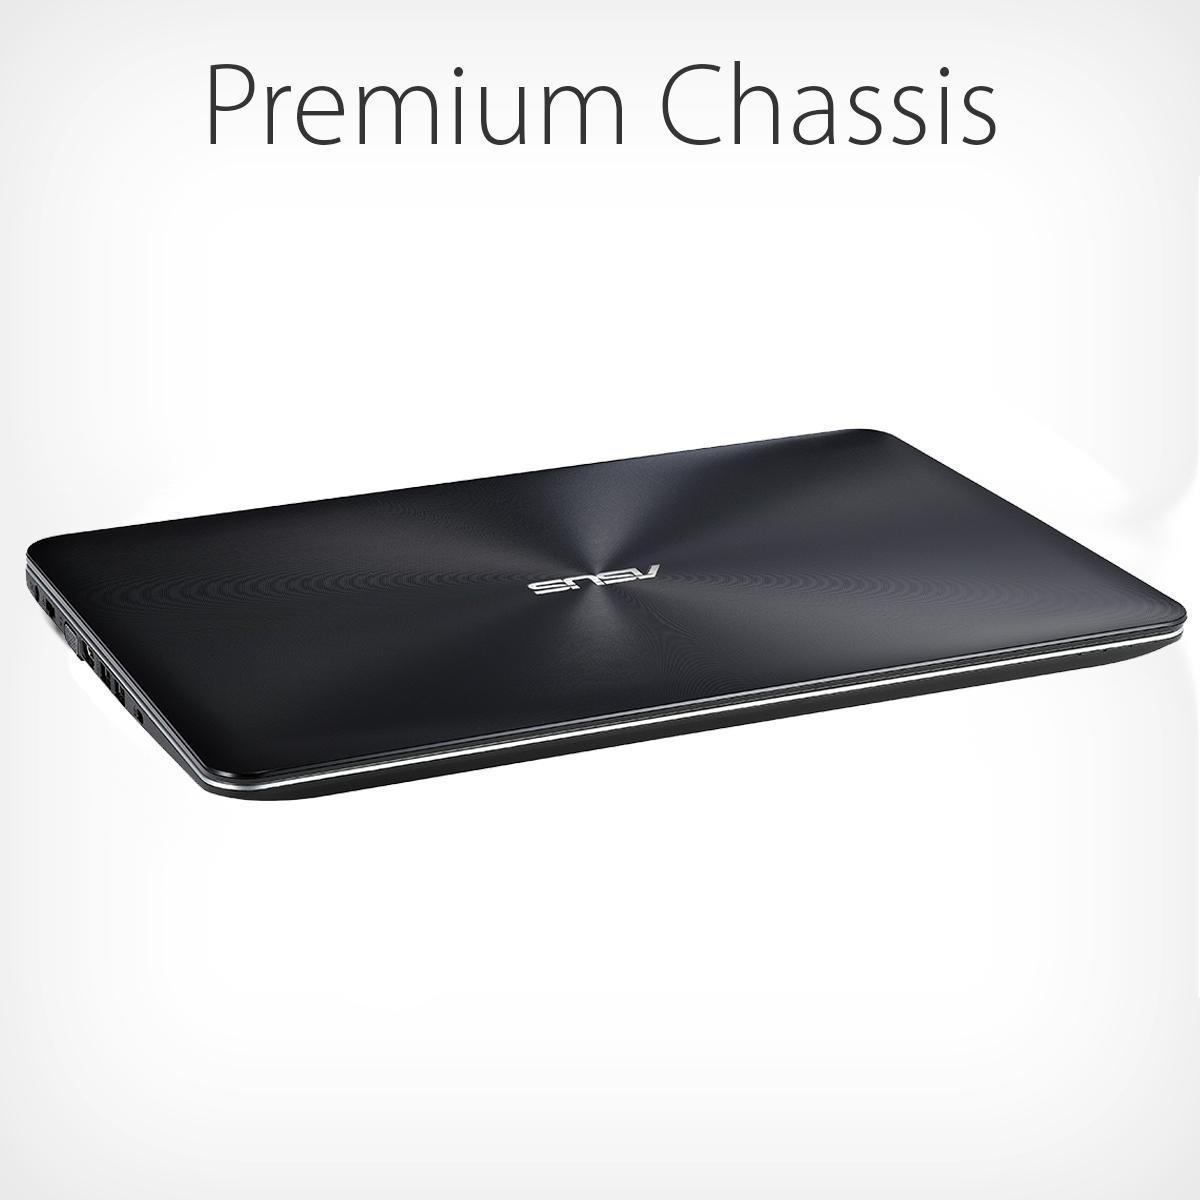 Amazon.com: ASUS X555DA-AS11 15 inch Full-HD AMD Quad Core Laptop with